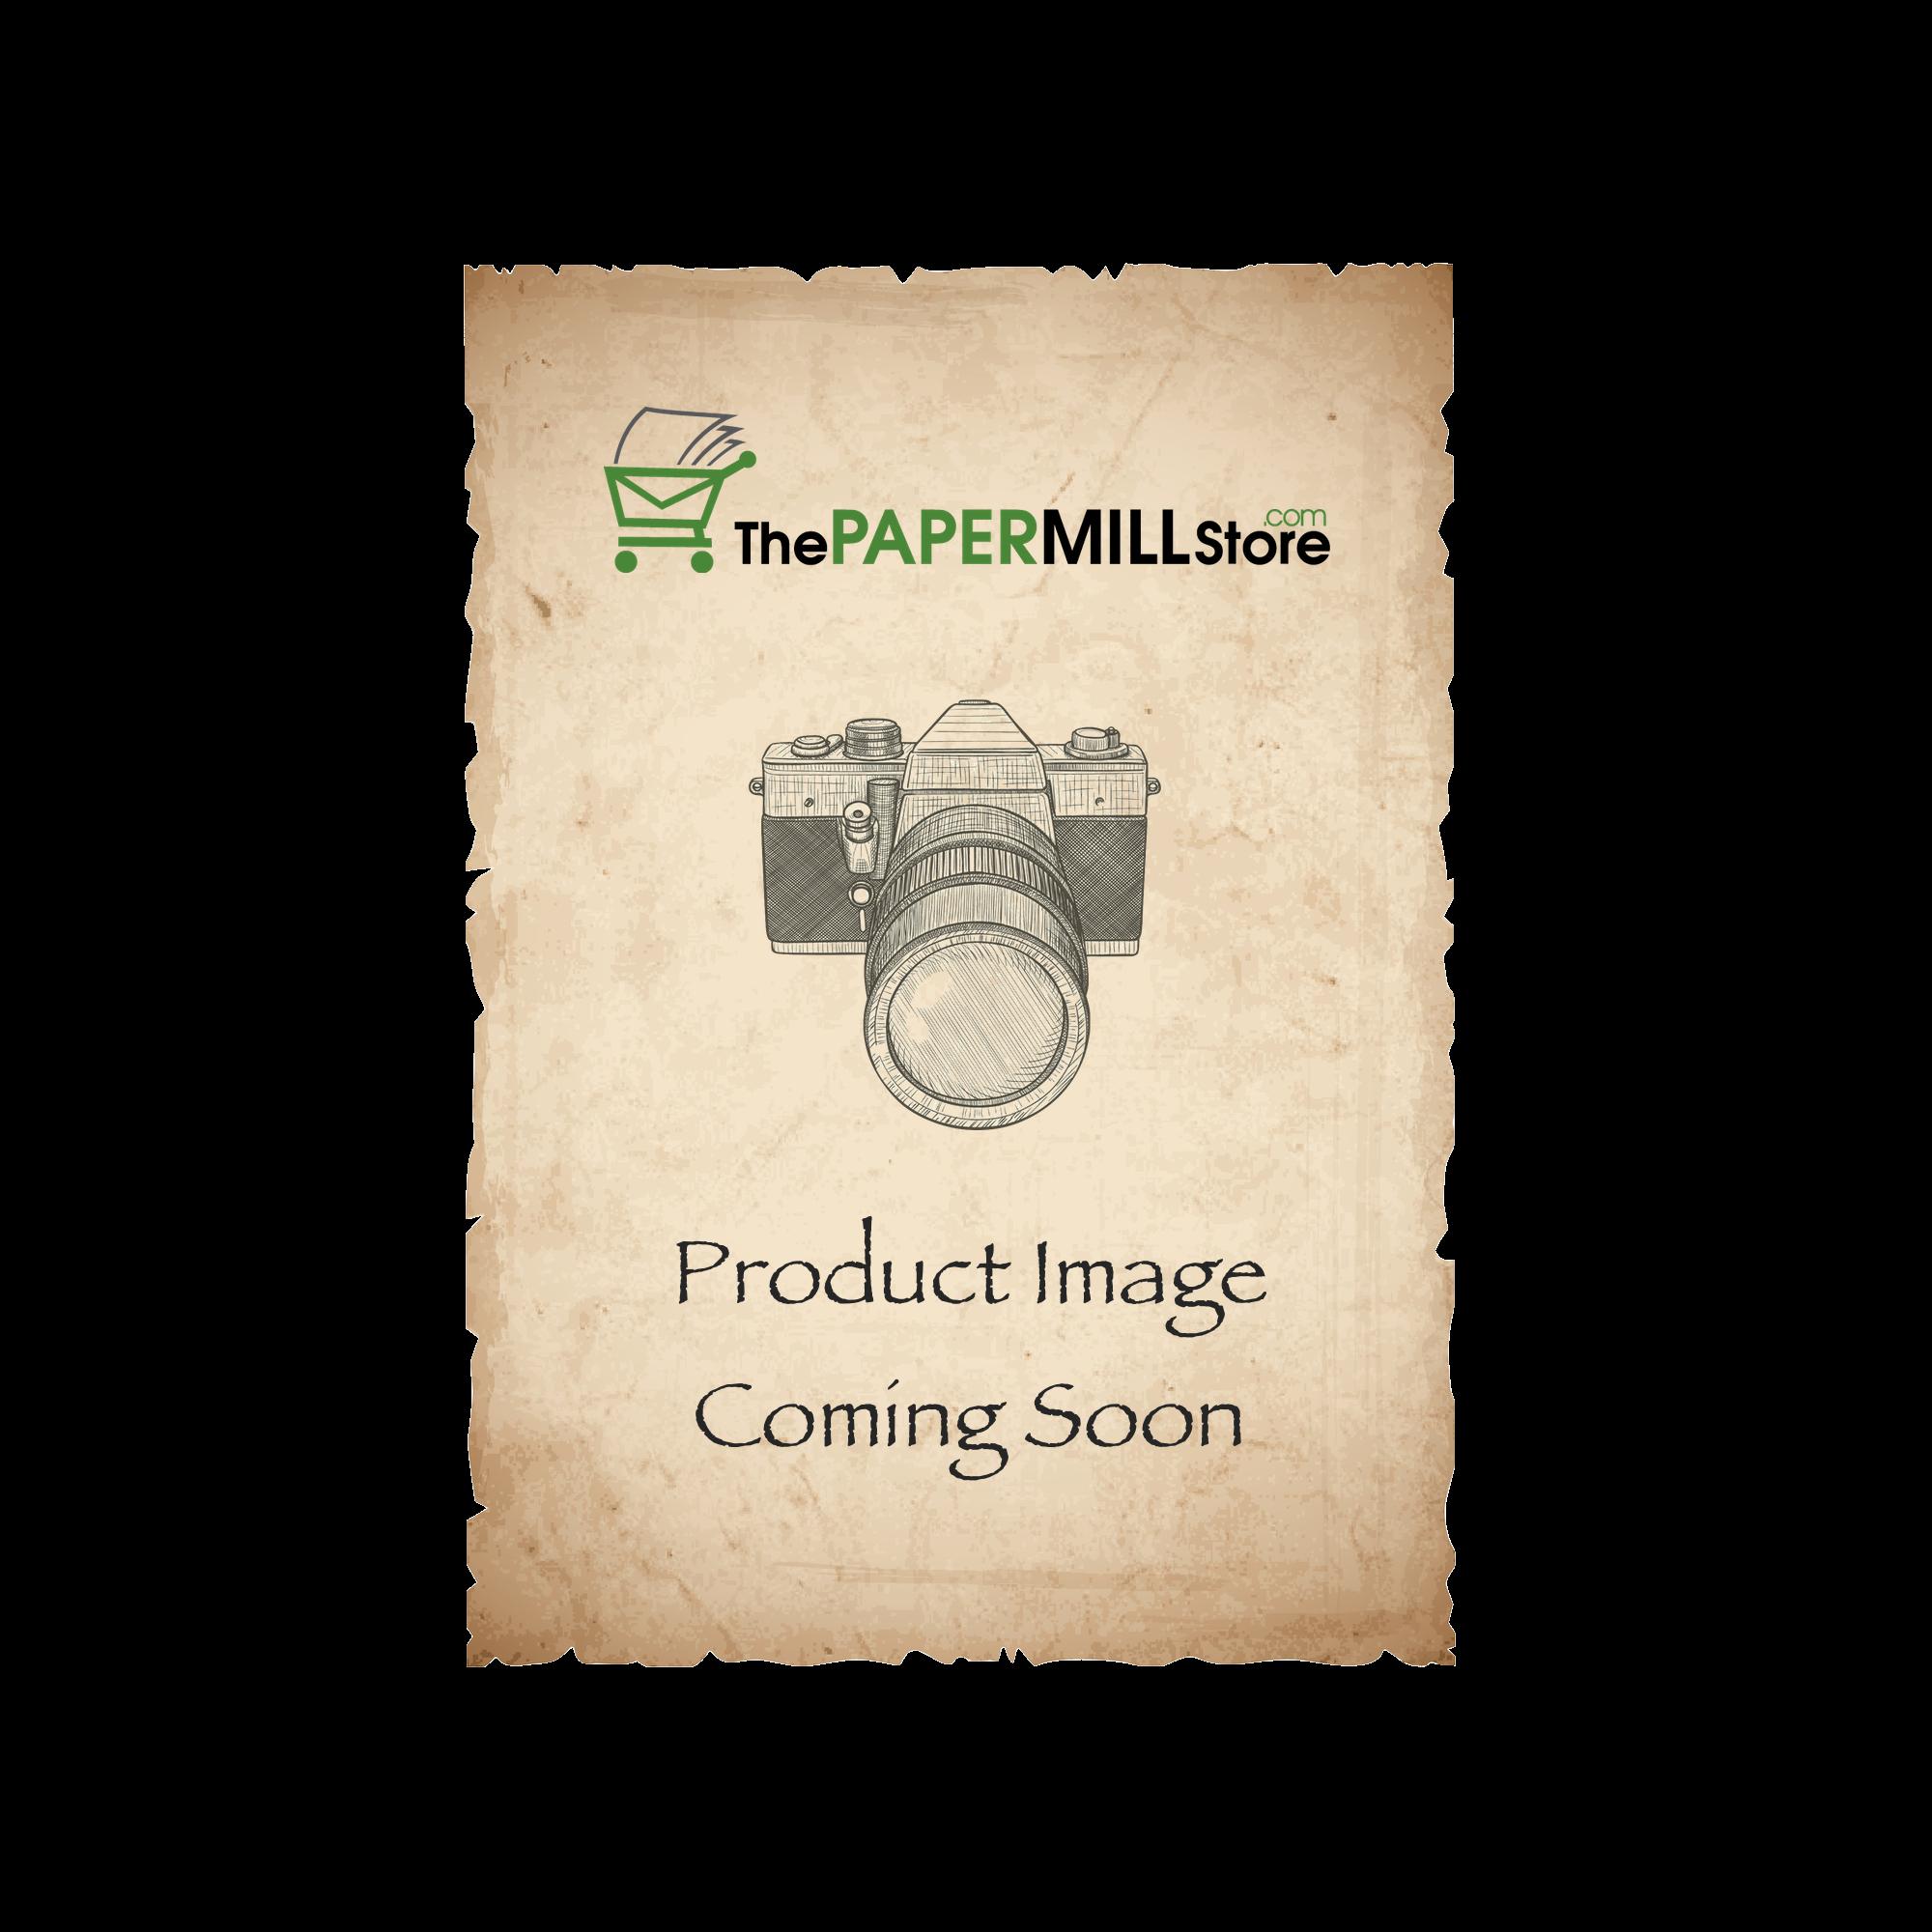 Pocket Folder - Presentation Folders 80 lb Cover HP Indigo & NexPress Certified C/1S White Glossy Finish 12 x 18 Folder 100 per Carton